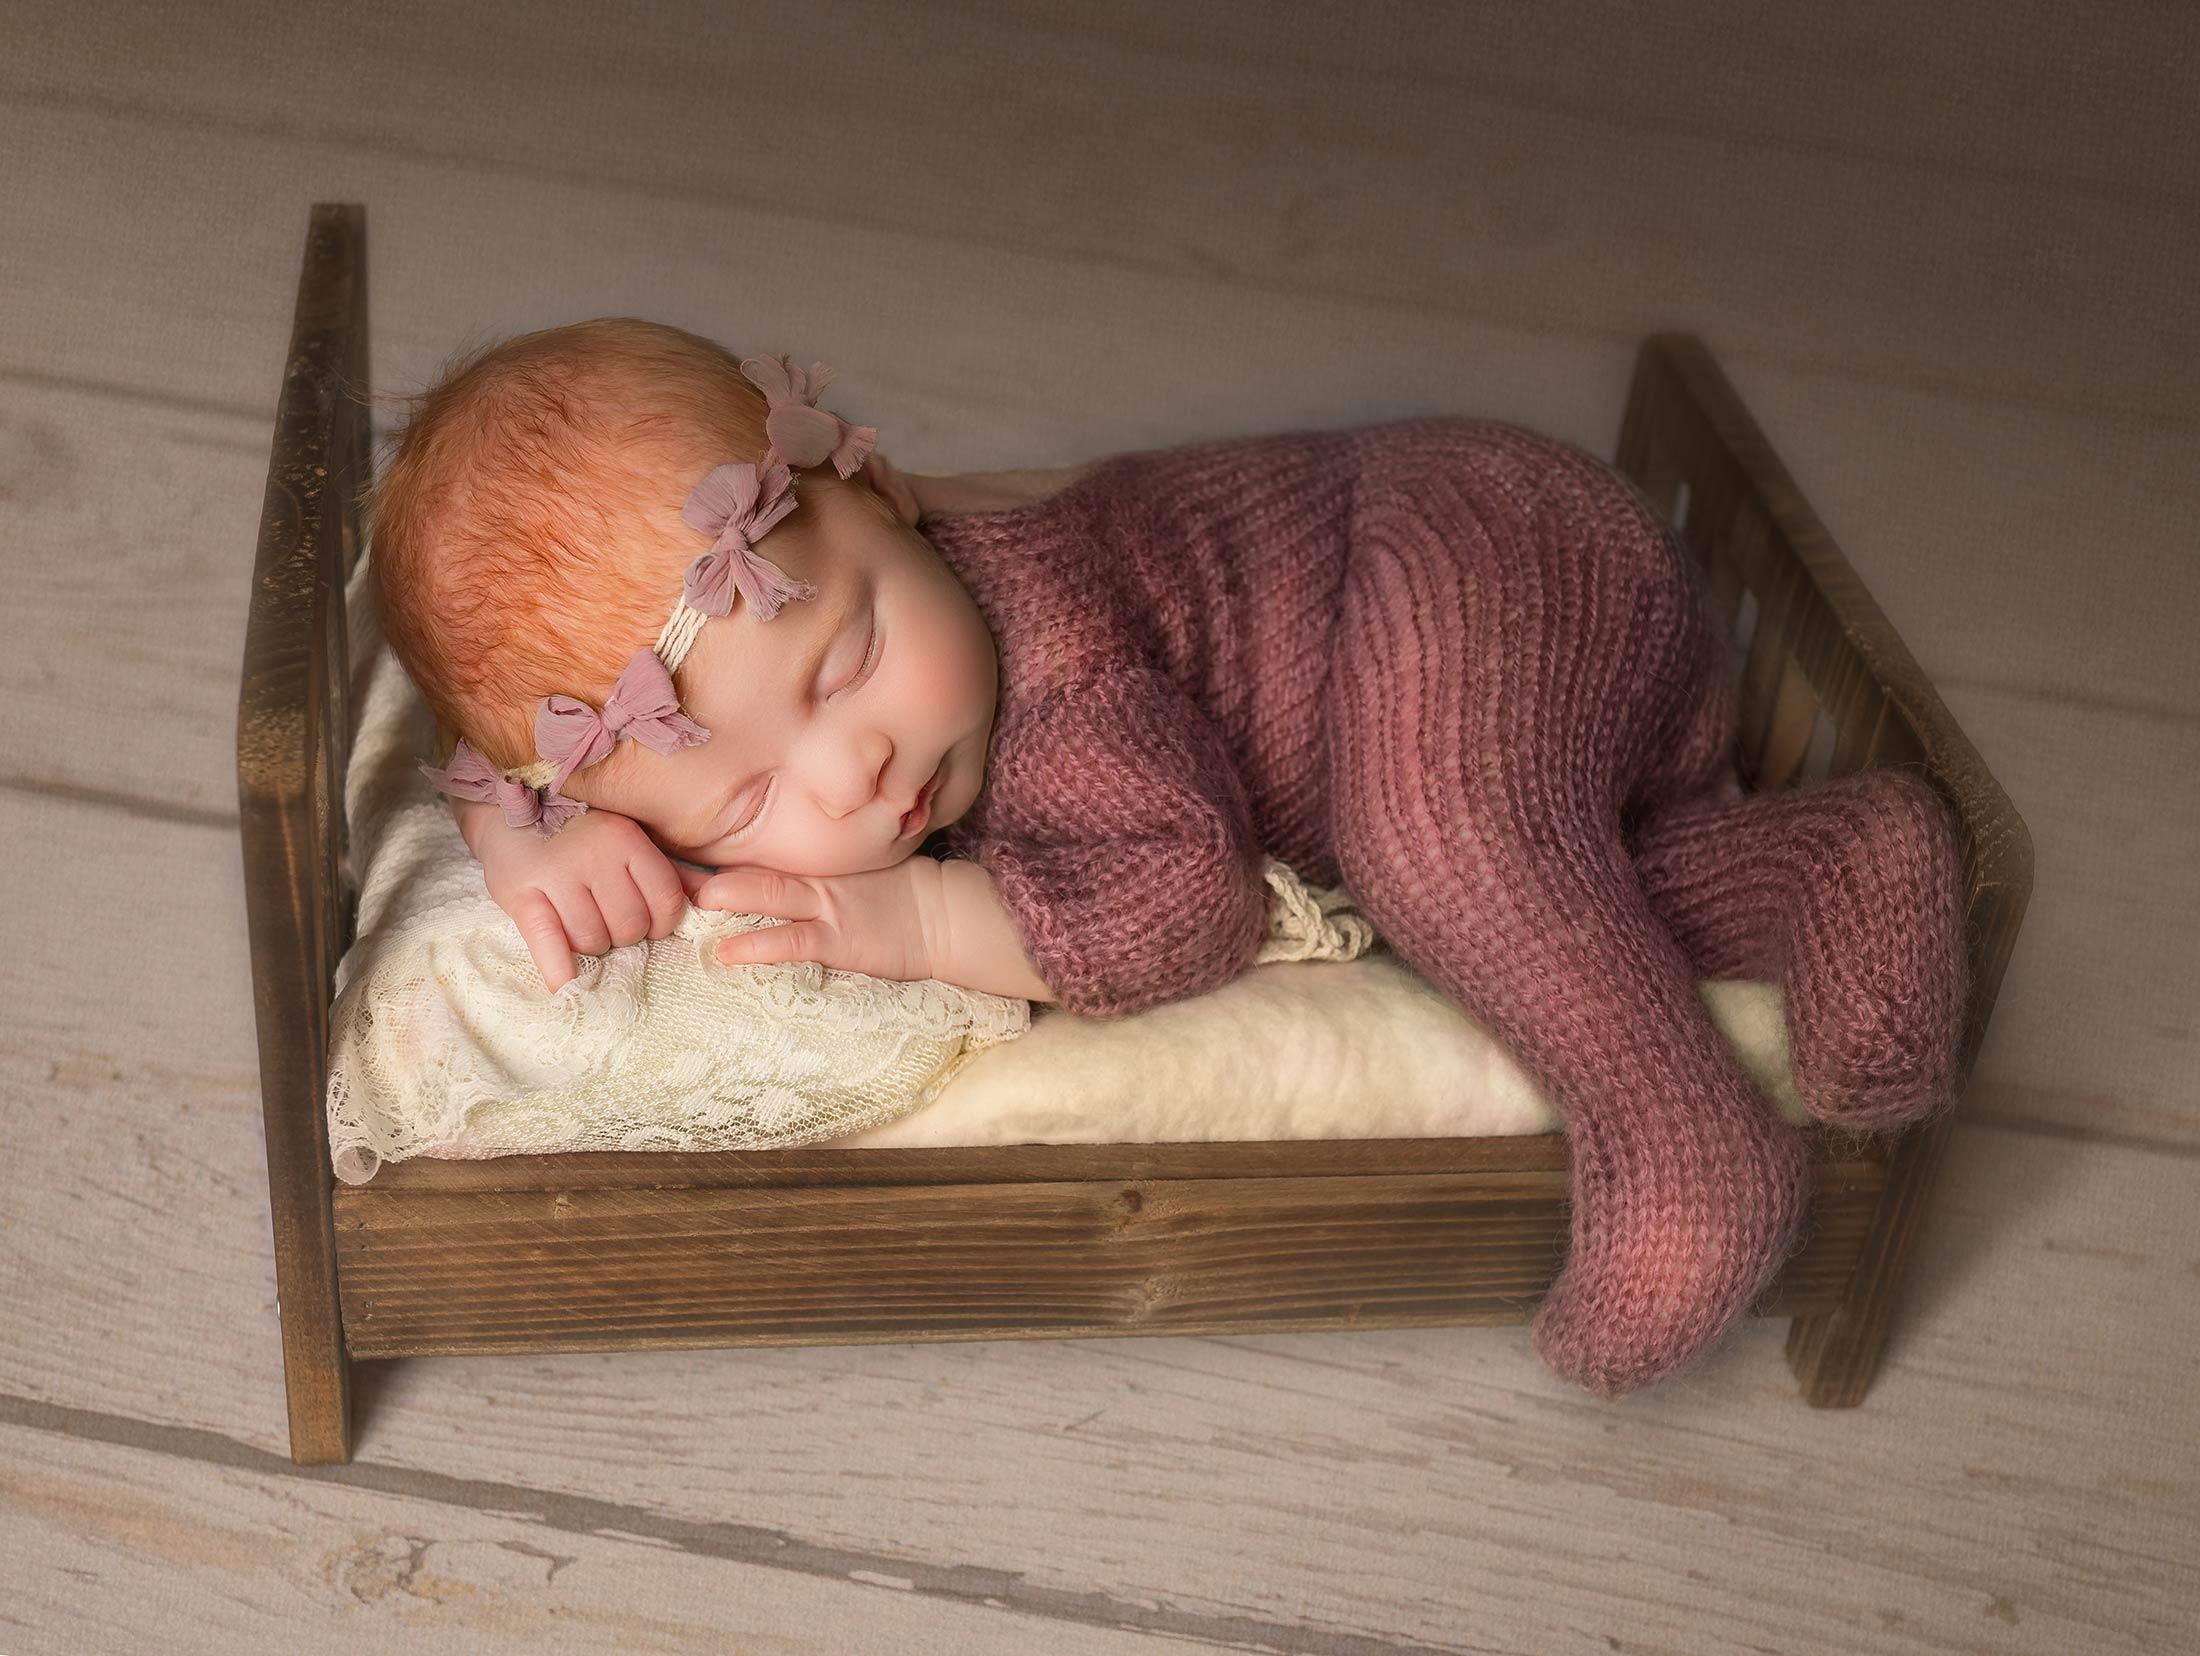 Newborn baby being photographed by New Born Photographer Moss & Ivy Photography | Geelong, Torquay, Jan Juc, Lara.